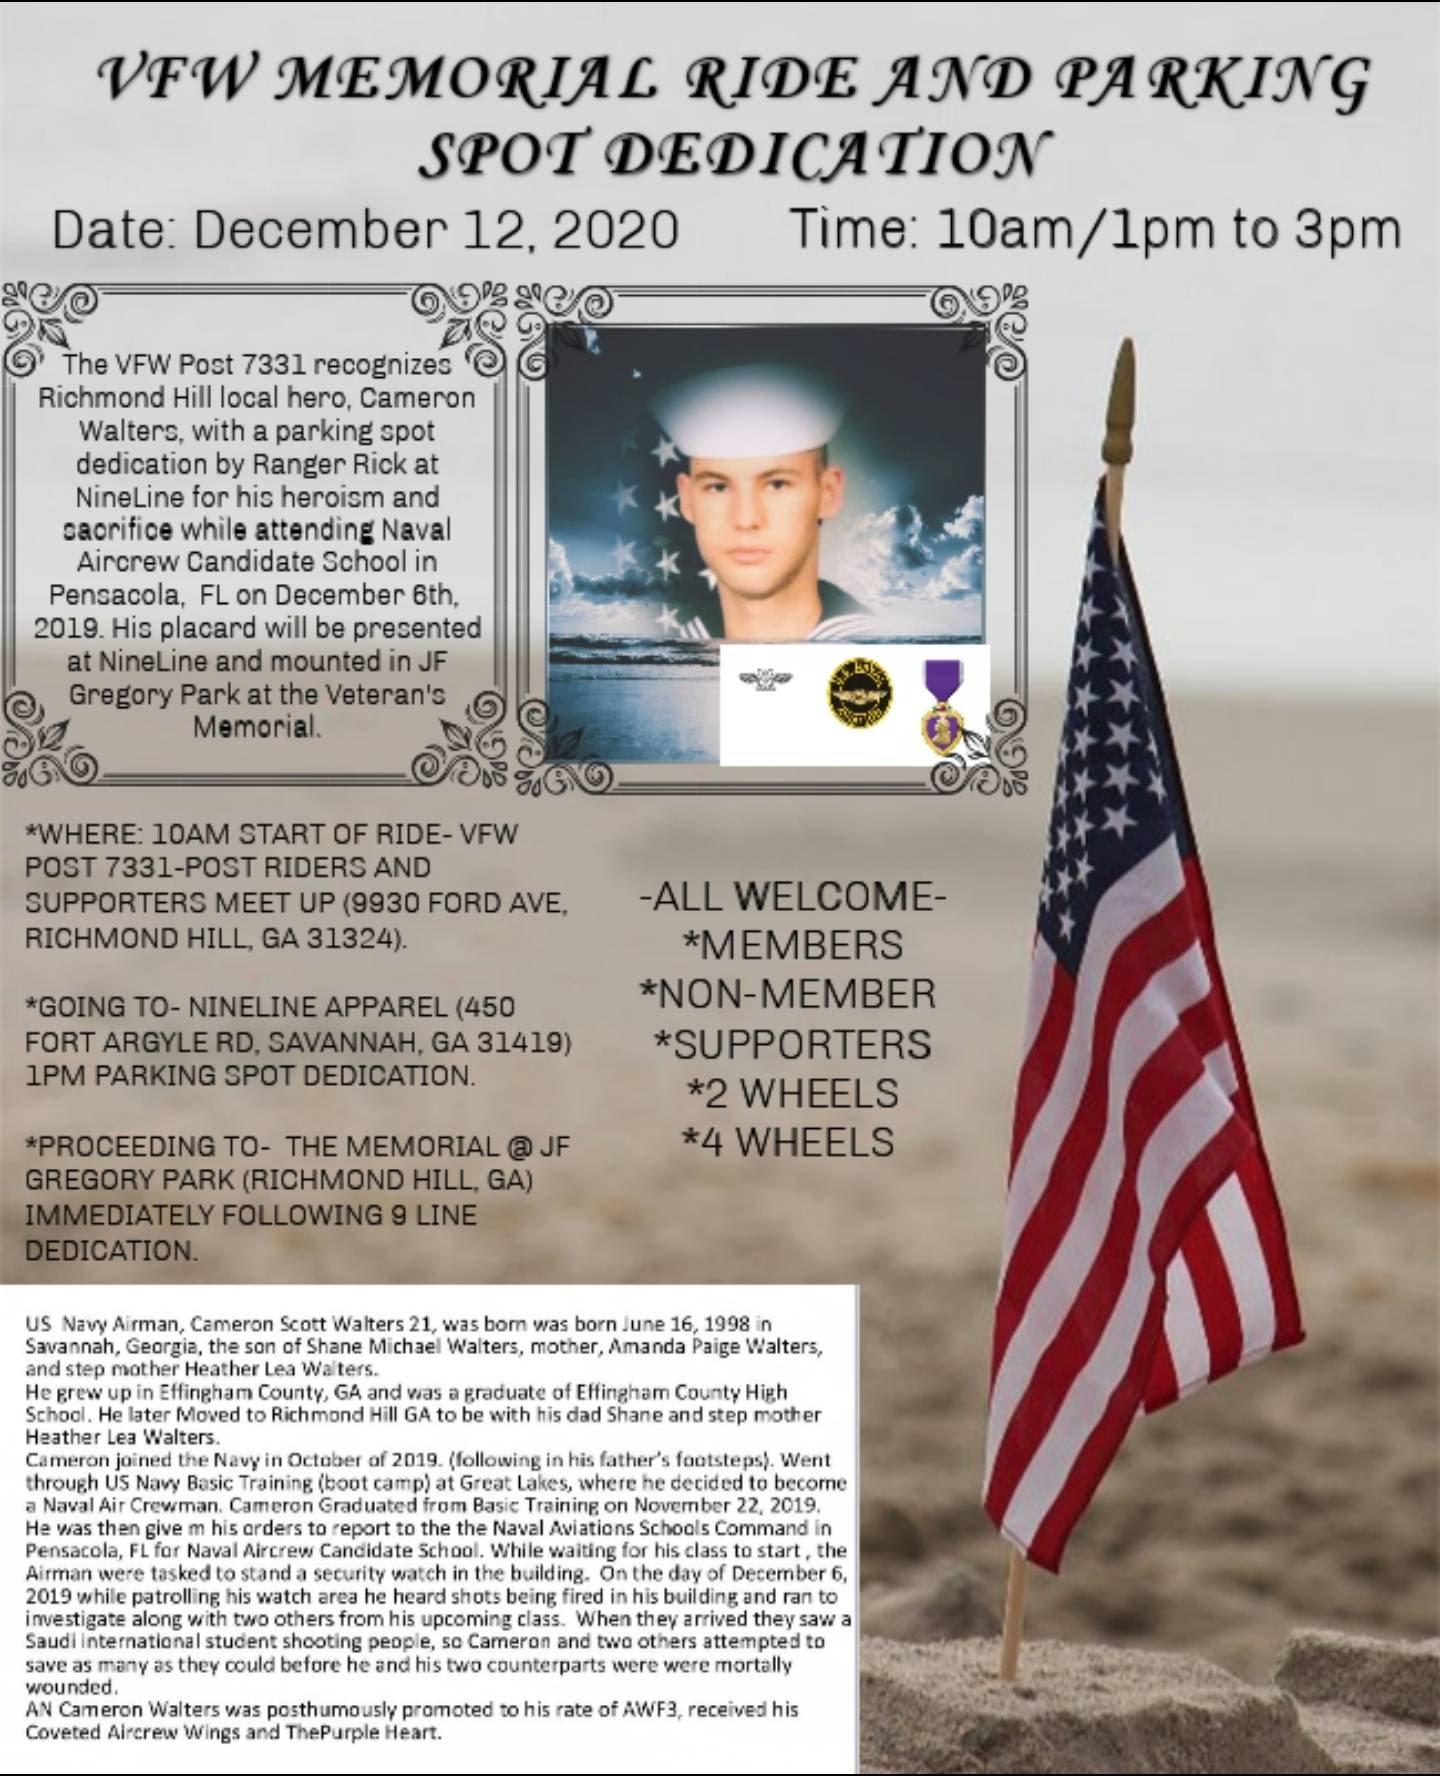 VFW Memorial Ride and Parking Spot Dedication @ VFW Post 7331 | Richmond Hill | Georgia | United States